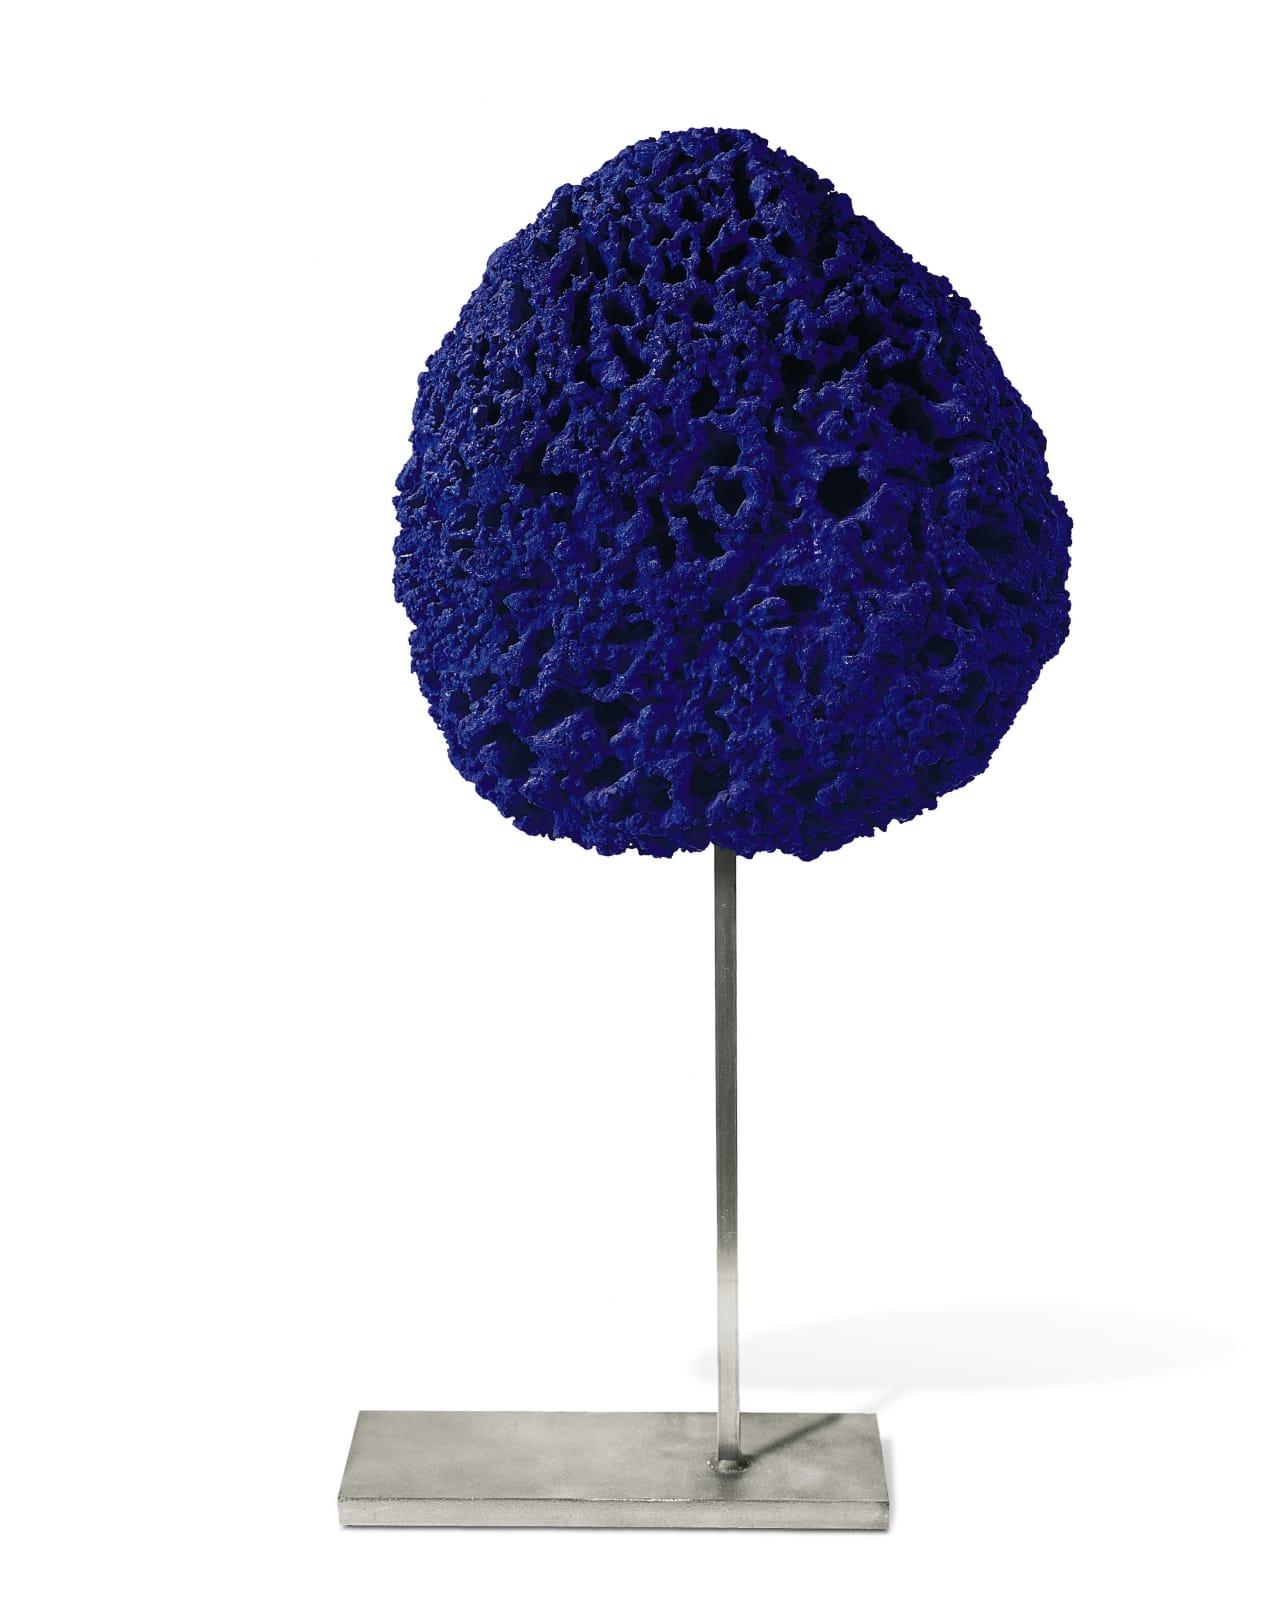 Yves Klein, Untitled Blue Sponge Sculpture, (SE 242), c. 1960